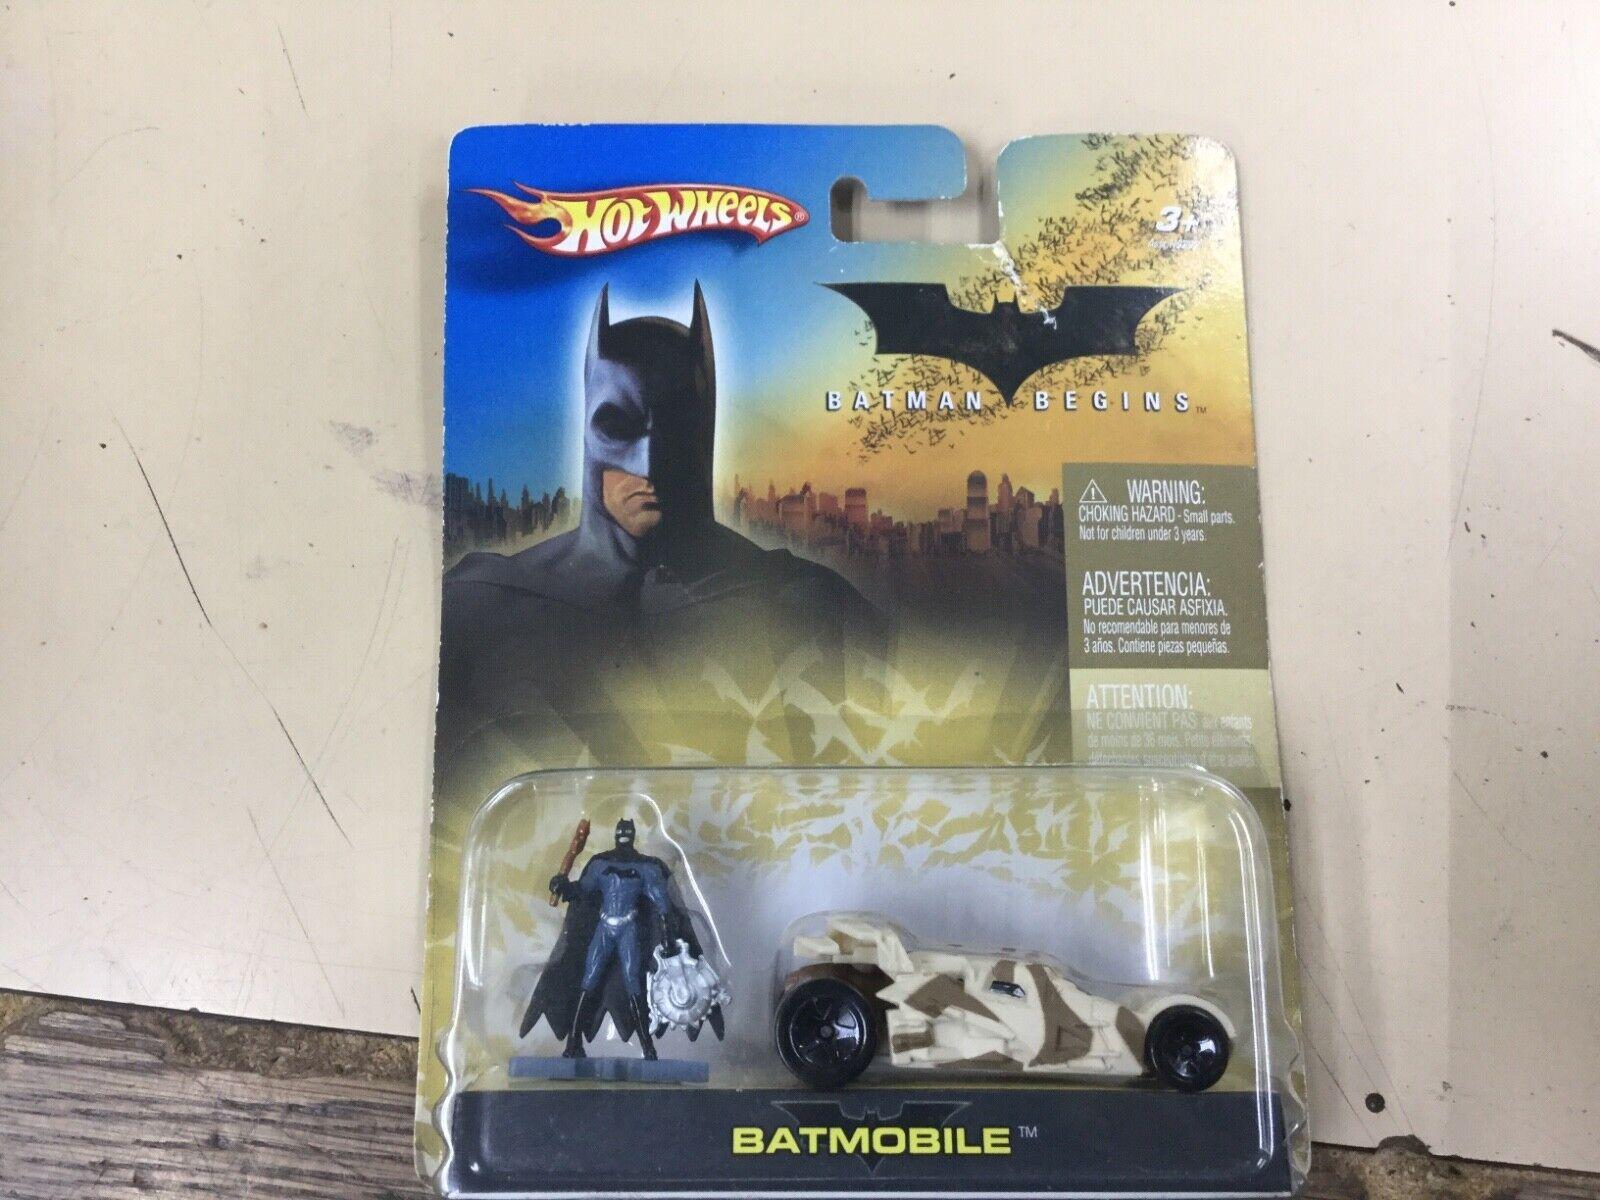 HOT WHEELS 2006 BATMAN BEGINS BATMOBILE WITH FIGURE